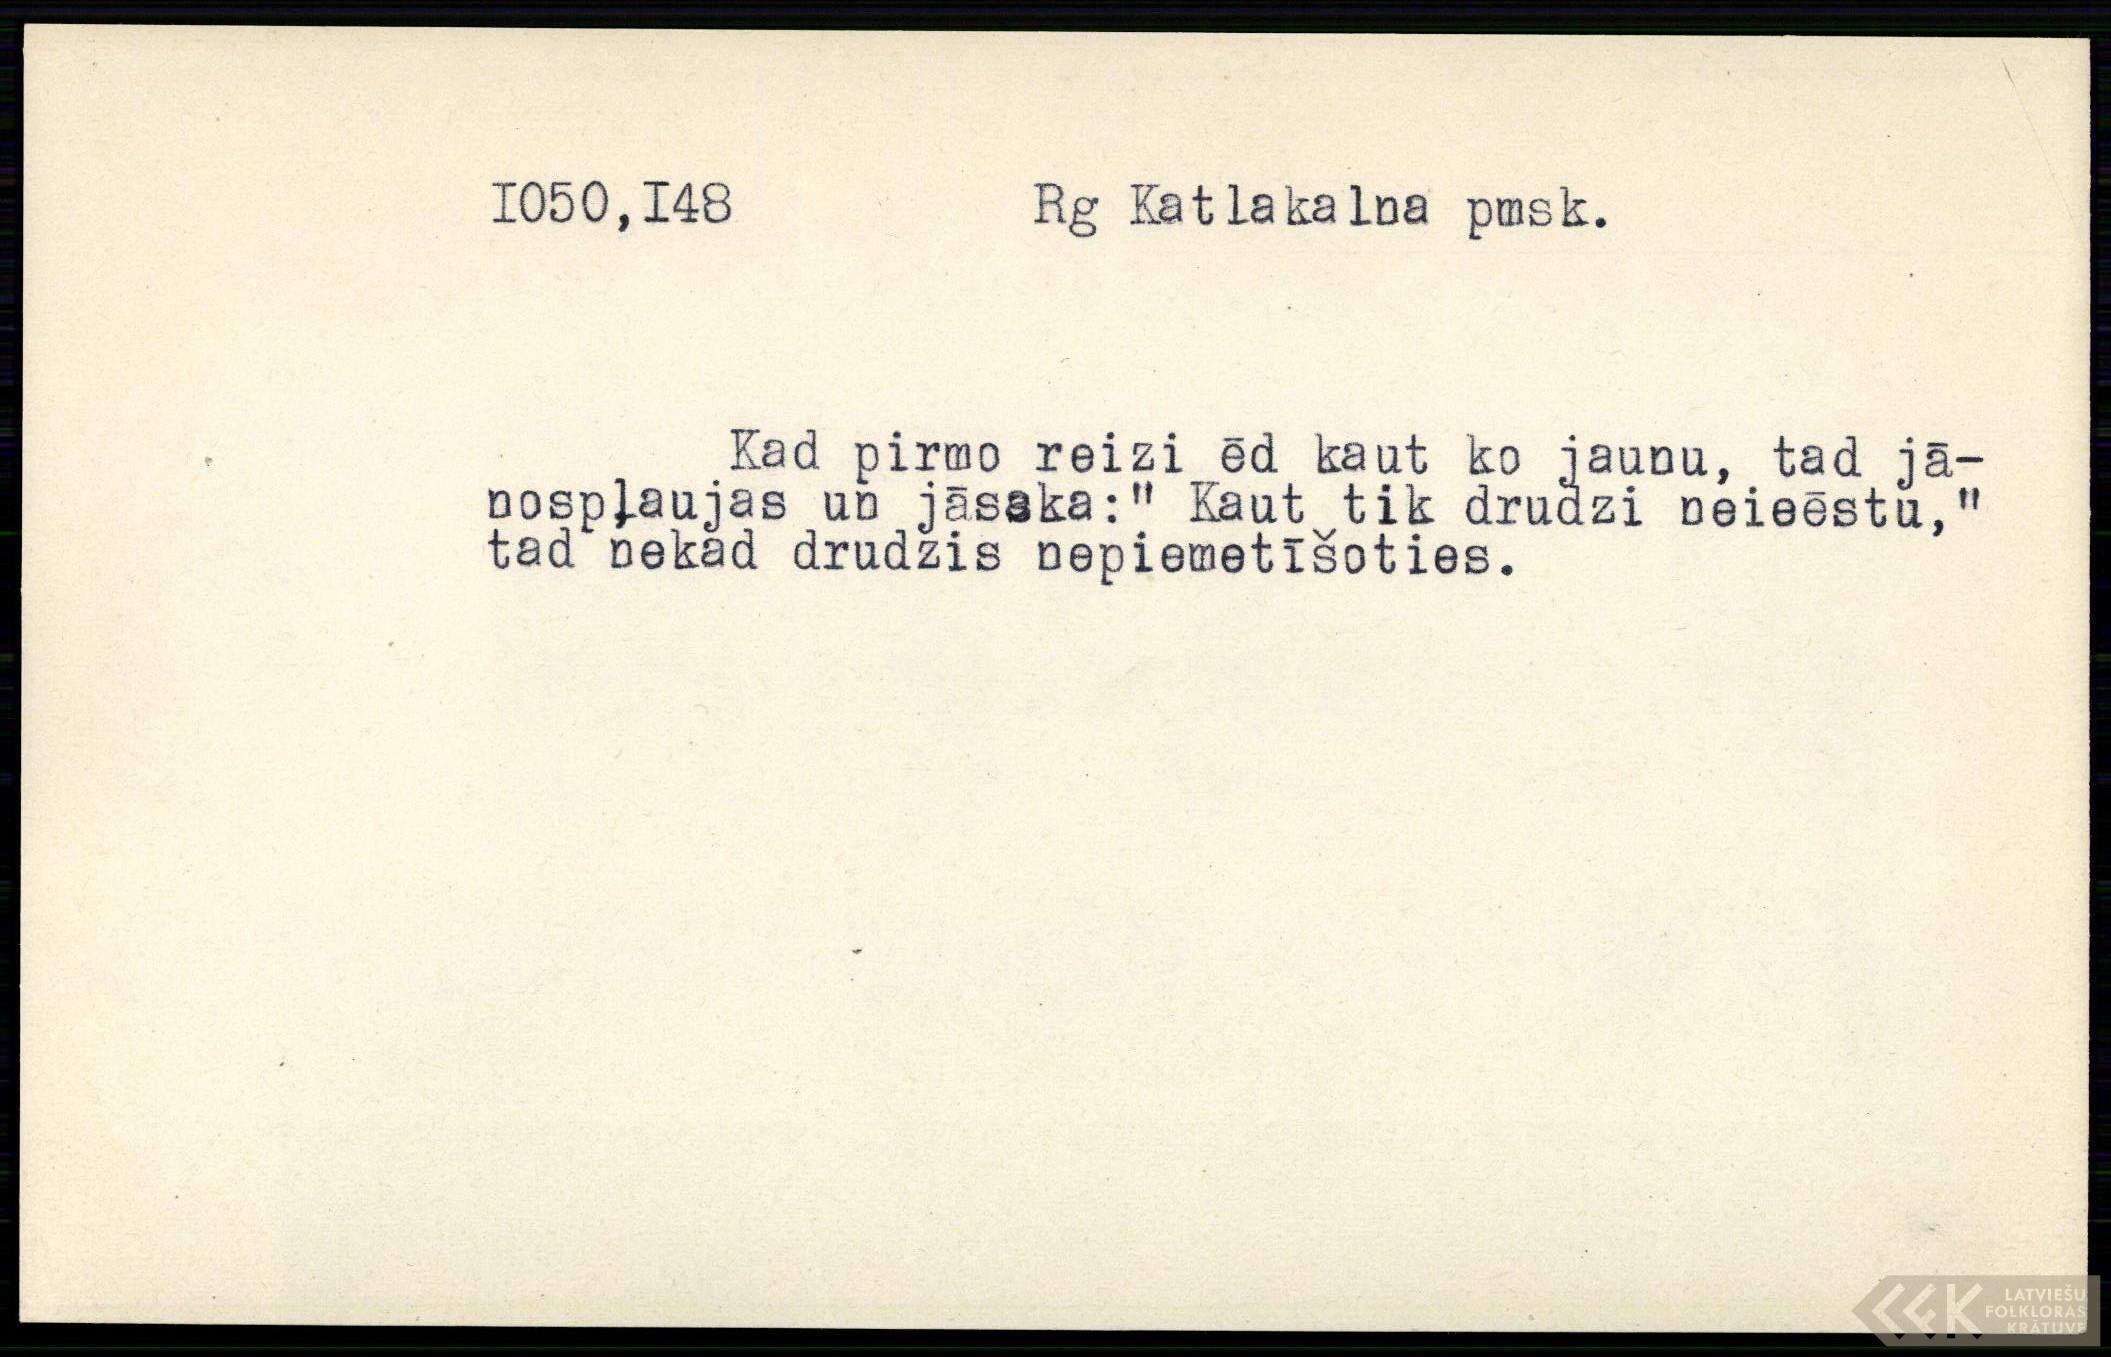 LFK-1050-00148-buramvardu-kartoteka